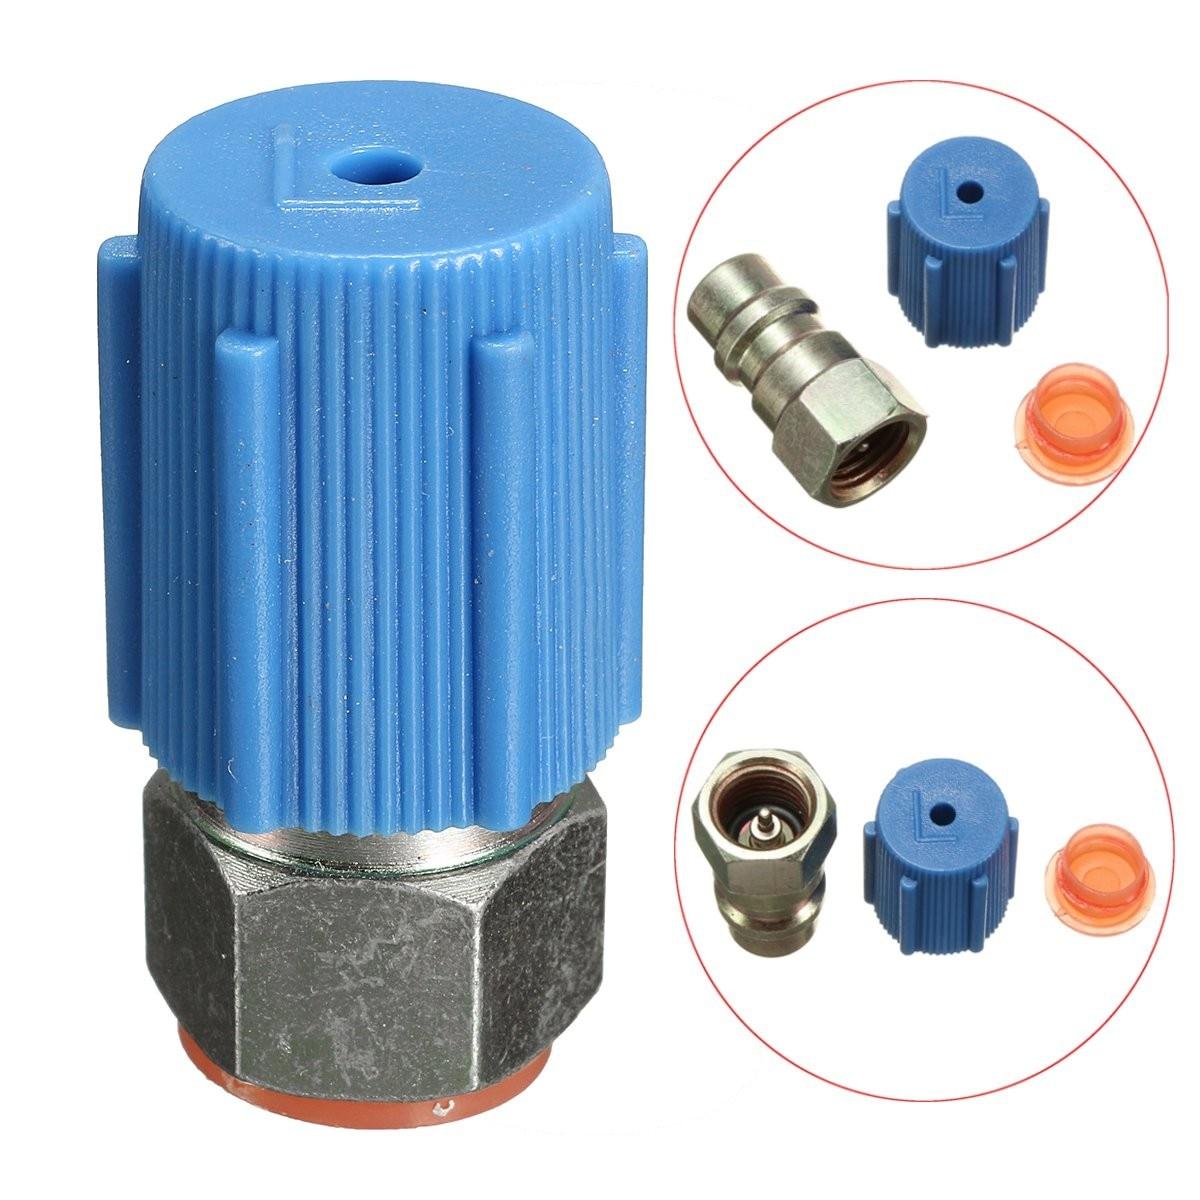 A//C Charging Port Adapter Retrofit R12 Port  to Accept R134a /'Quick Disconnect/'